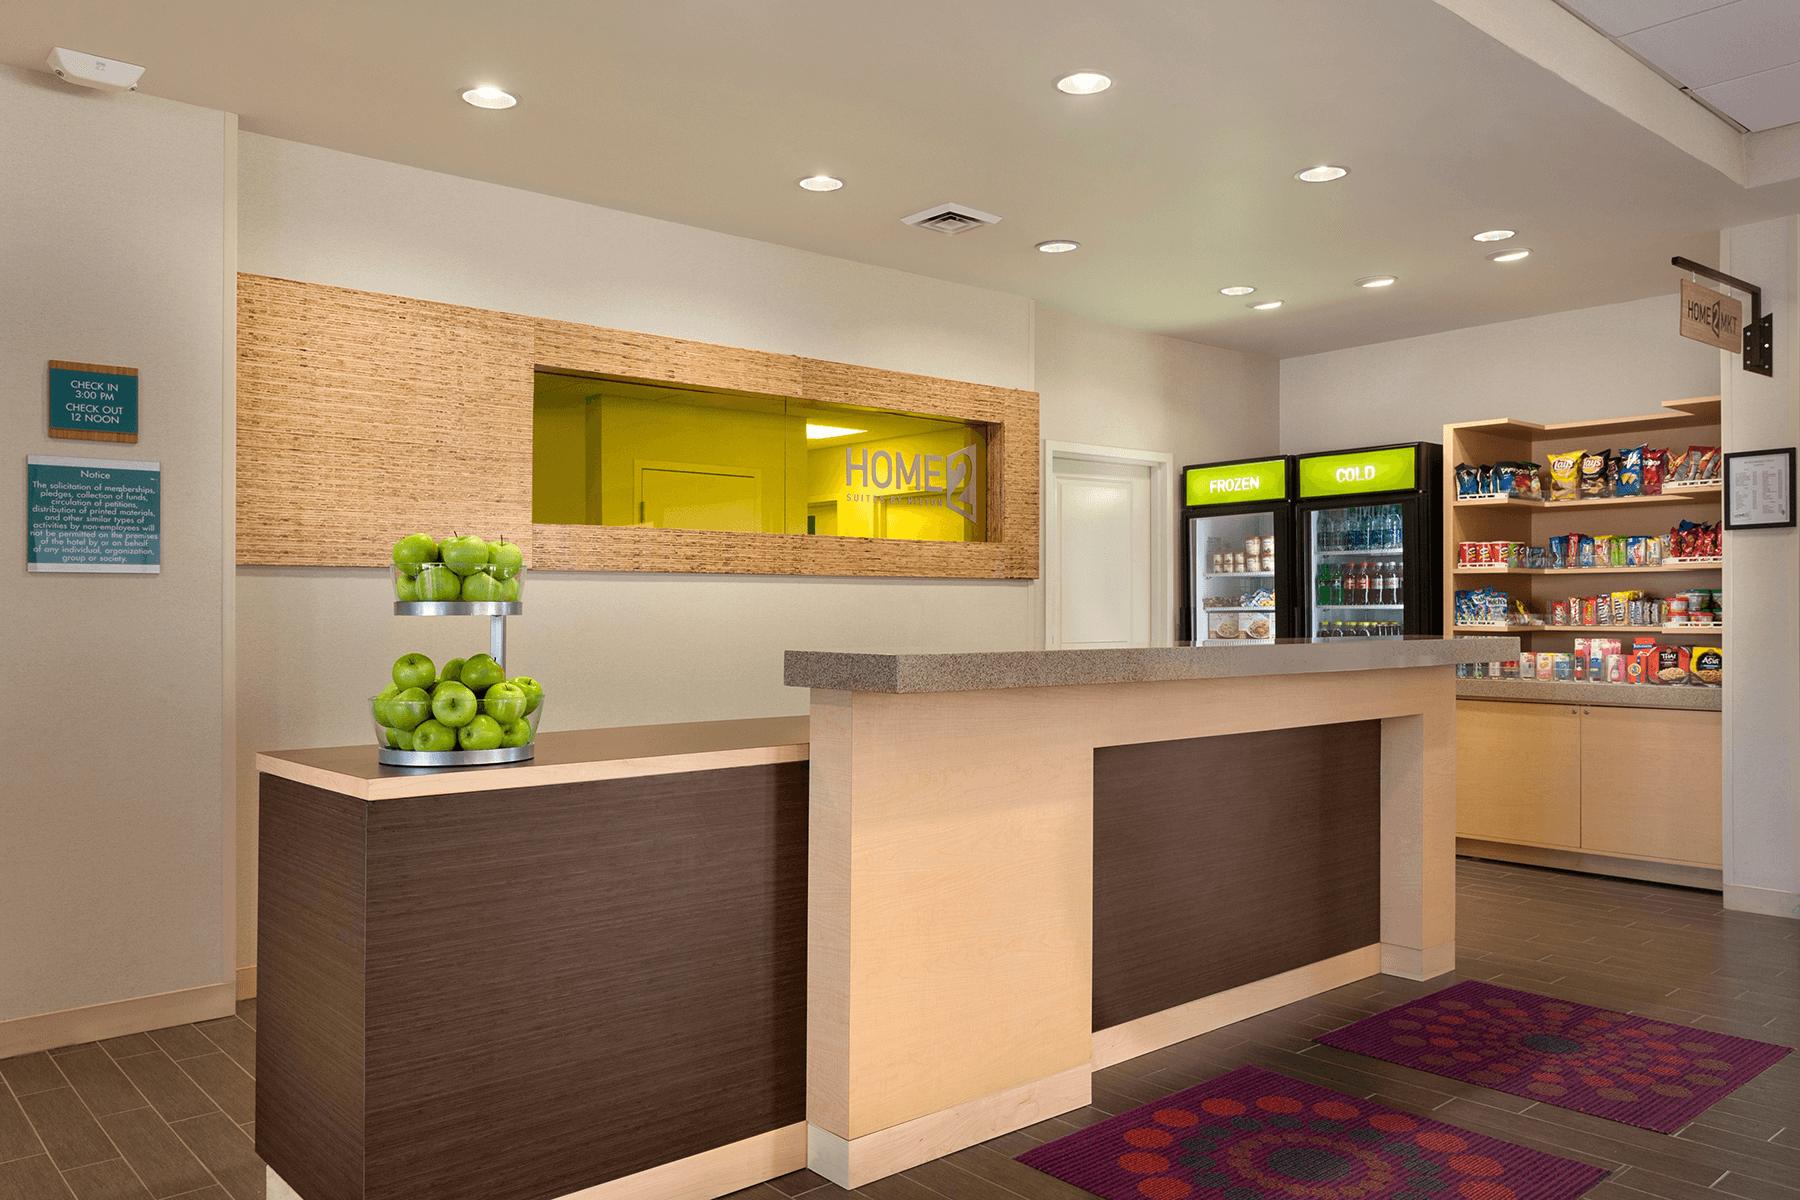 Home2 Market - Convenience Store